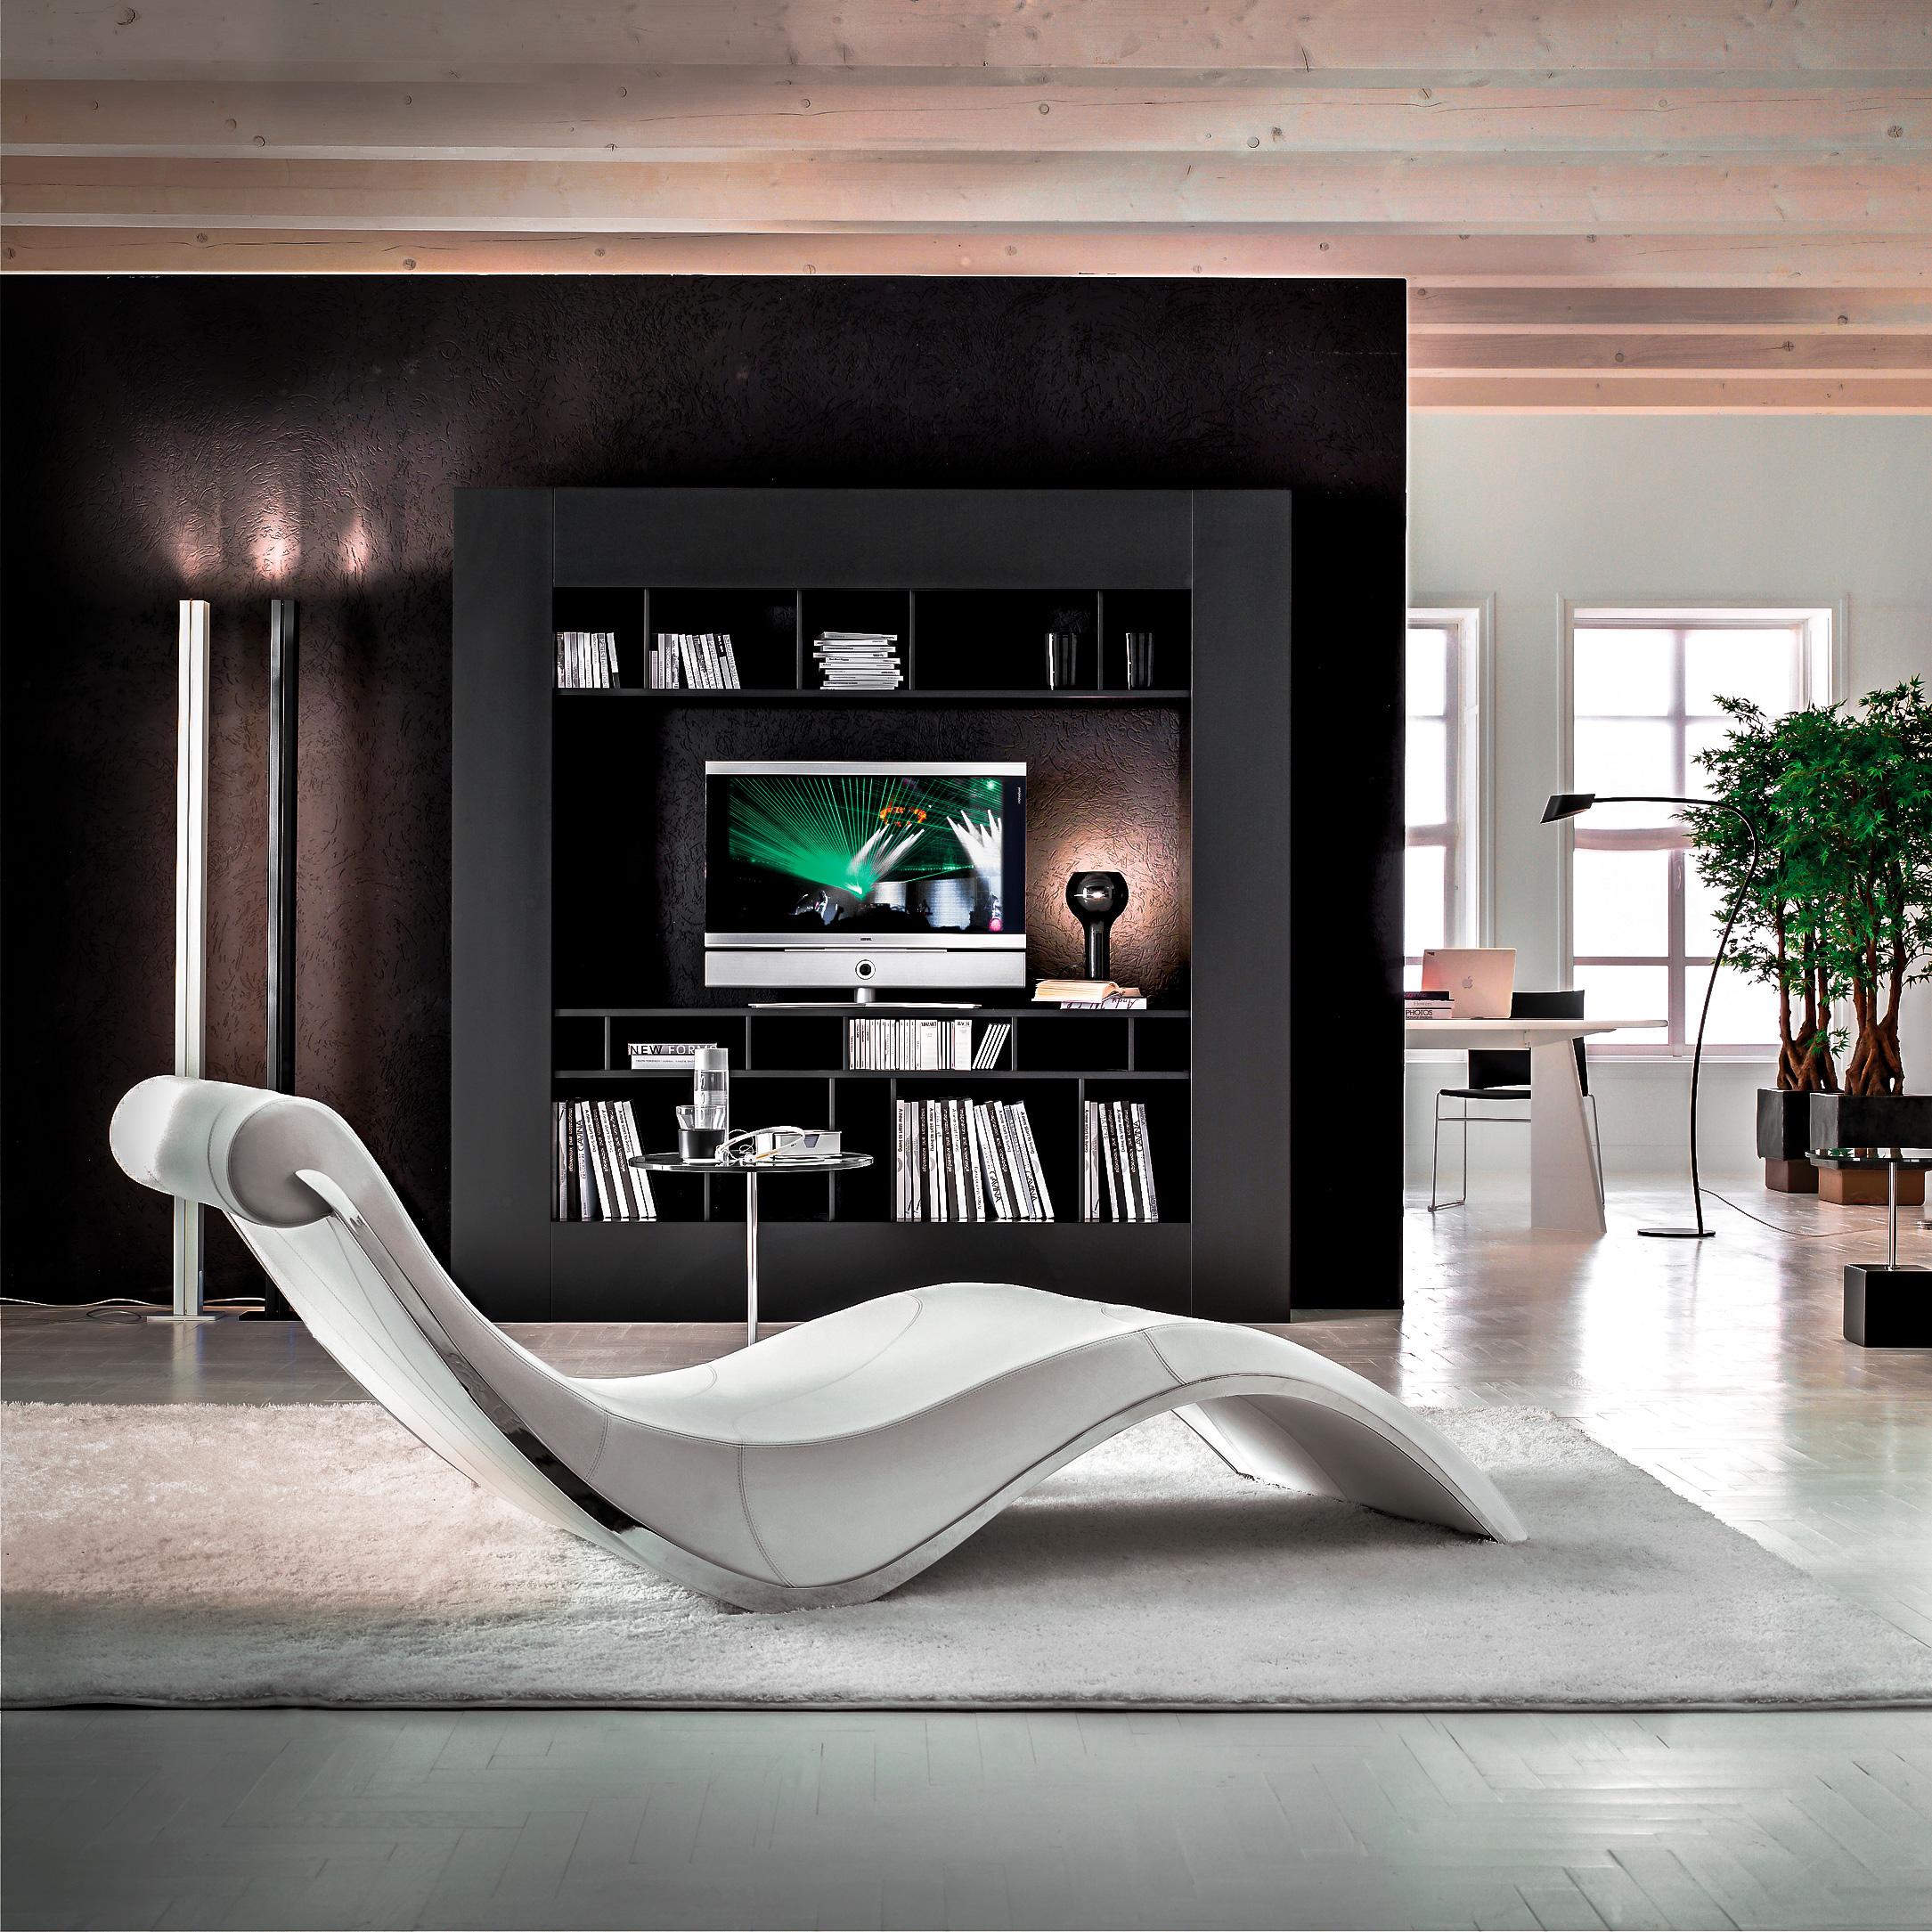 High End Dining Room Furniture Brands: Italian Designer & Luxury Furniture At Cassoni